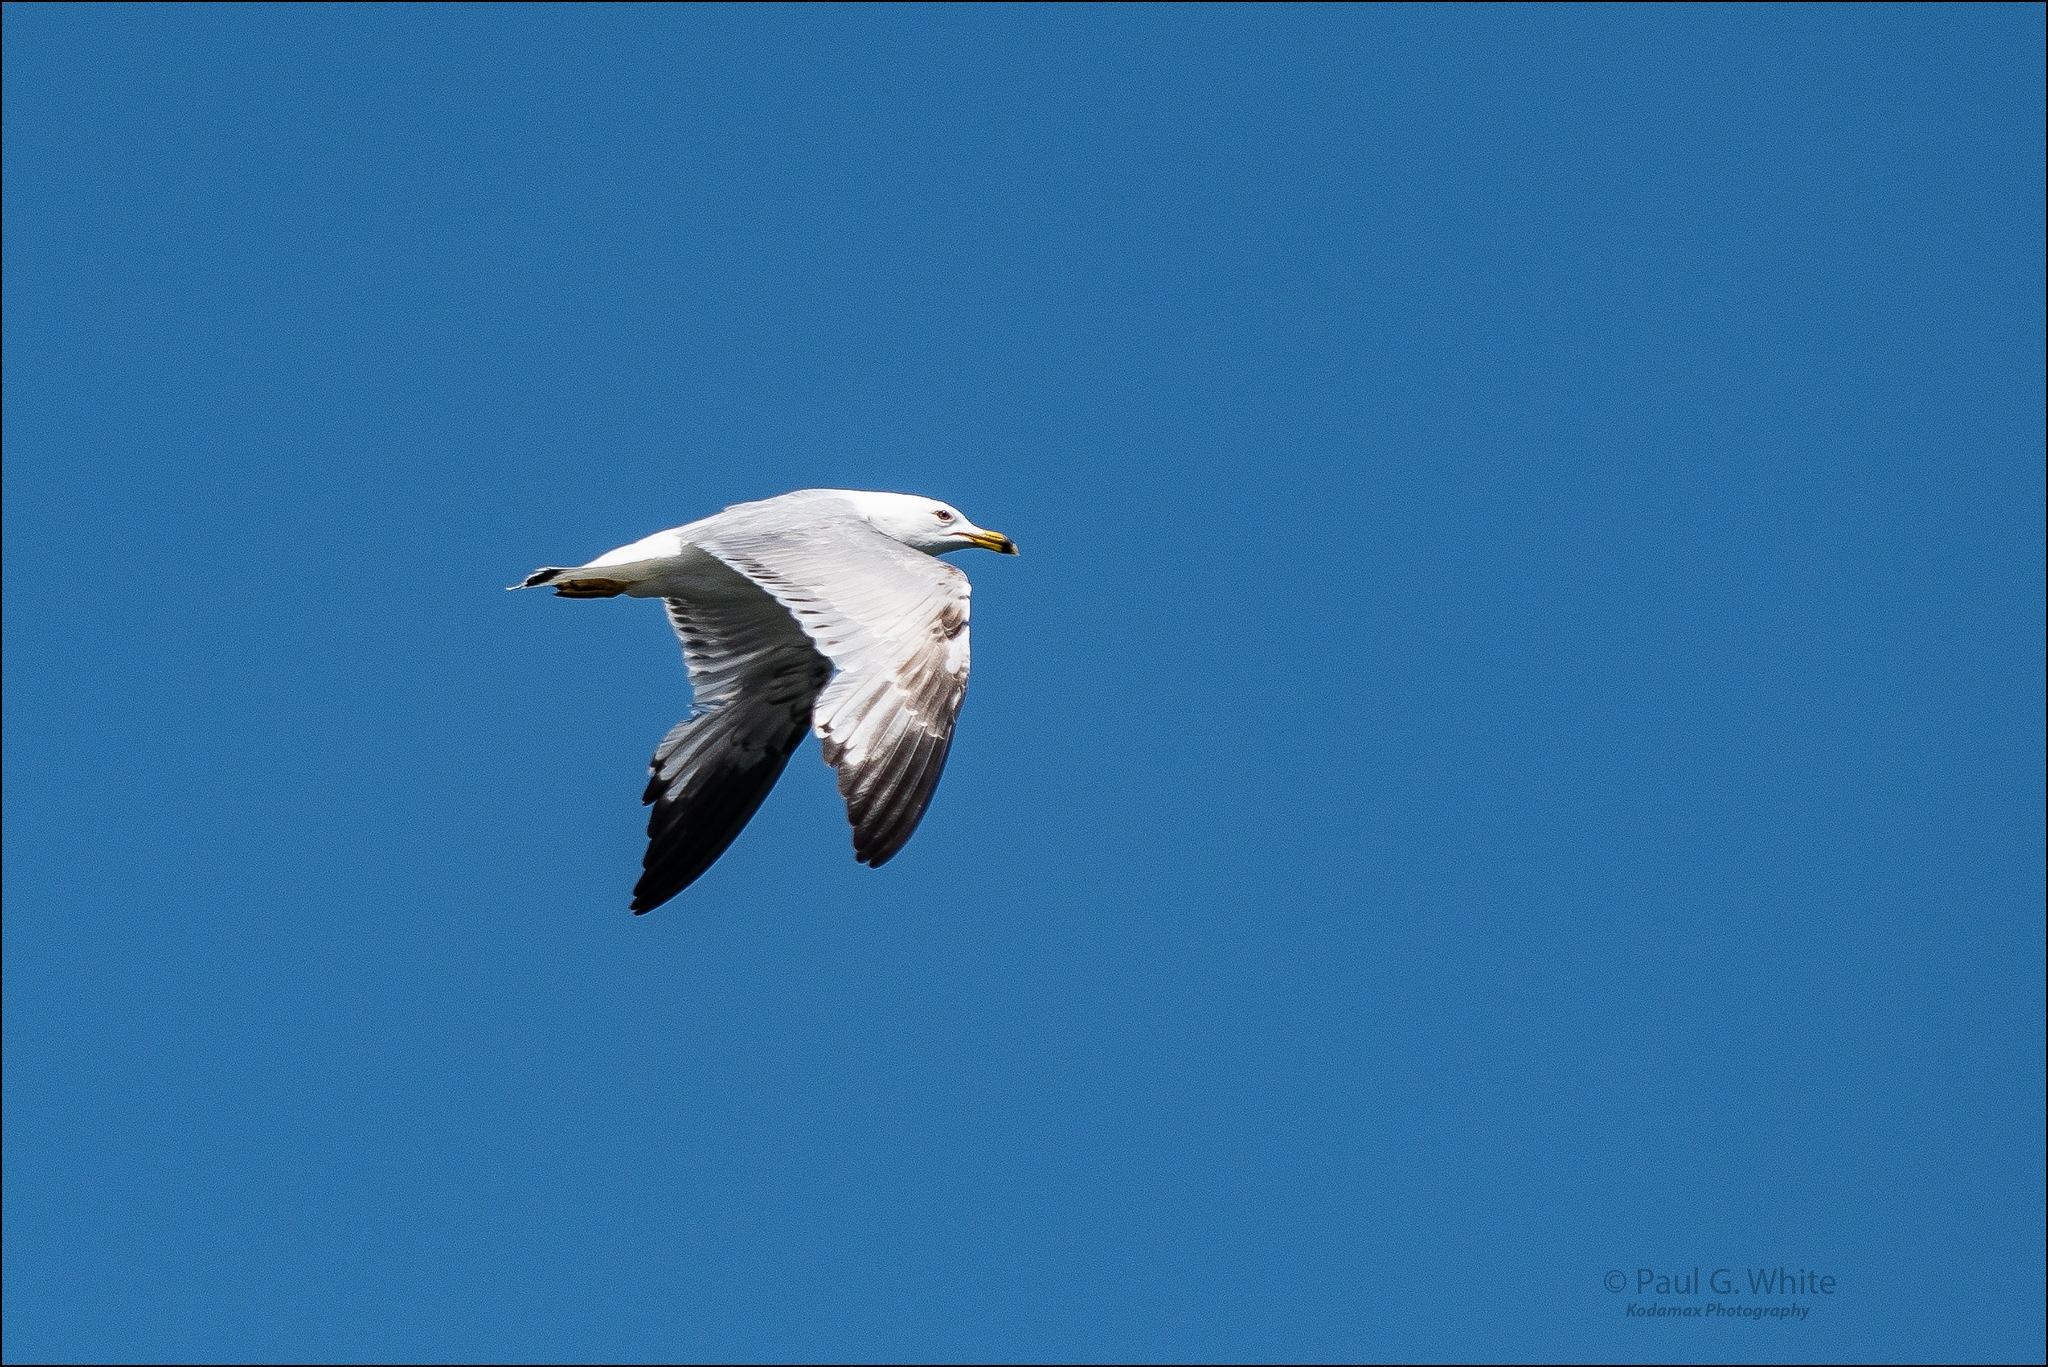 """Grumpy Seagull"" by paul.g.white"